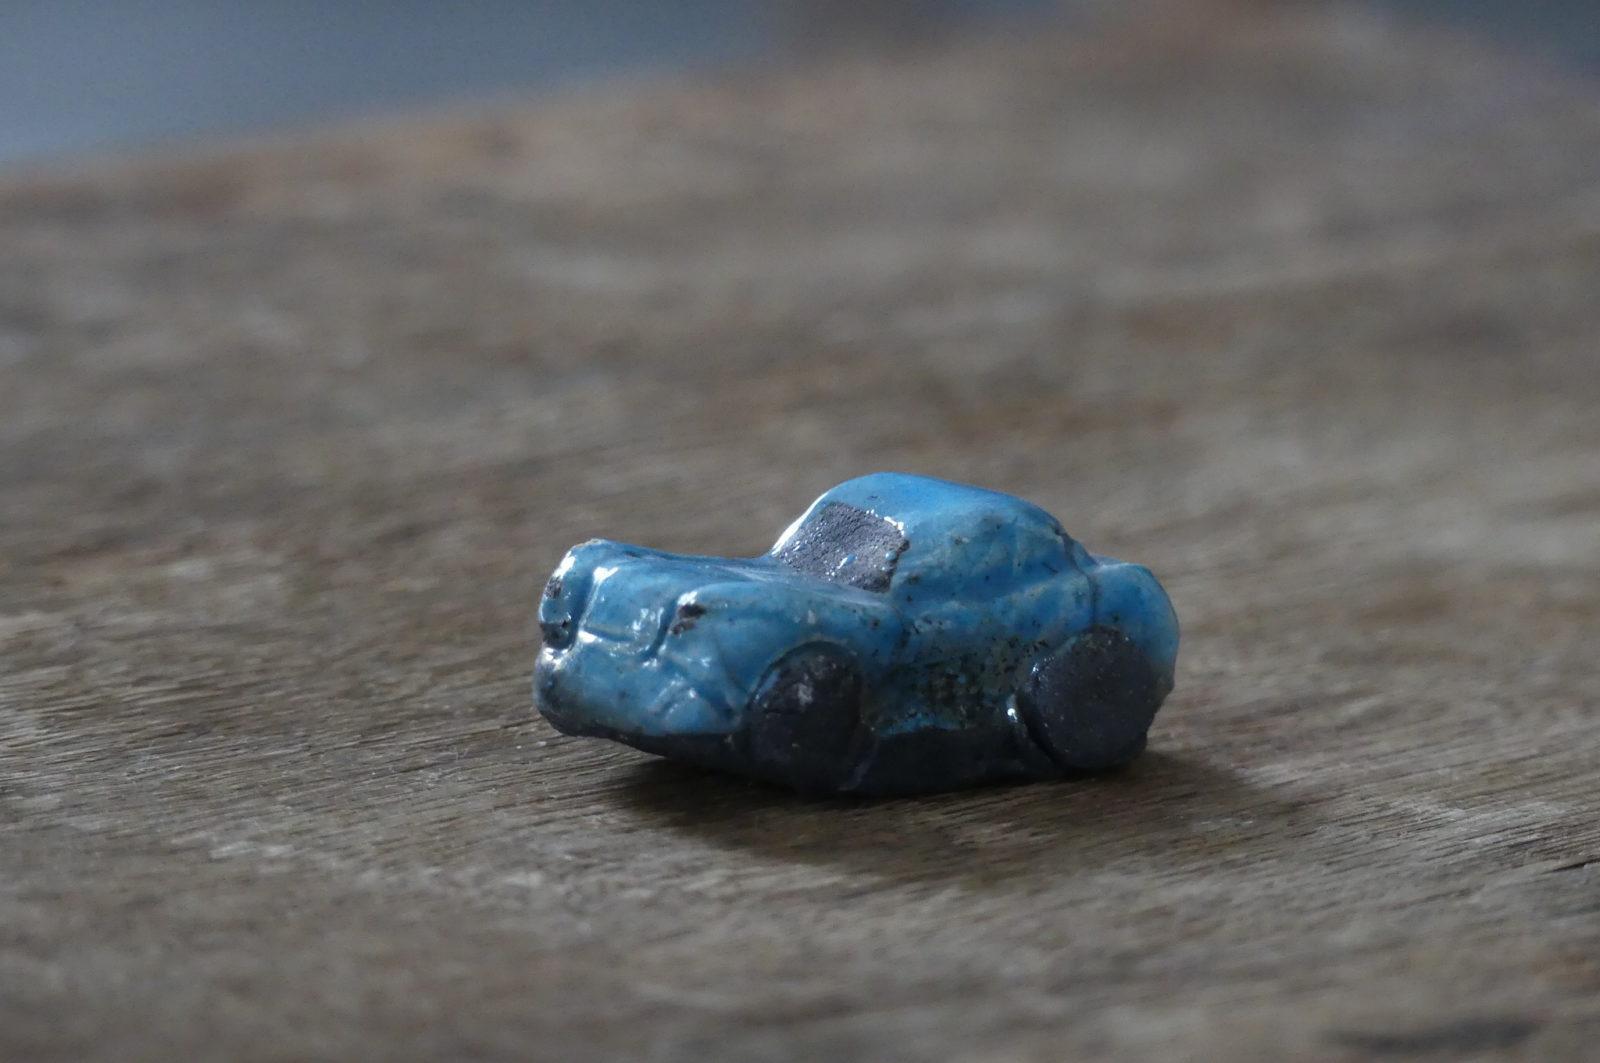 petite voiture bleu sur fond bois raku